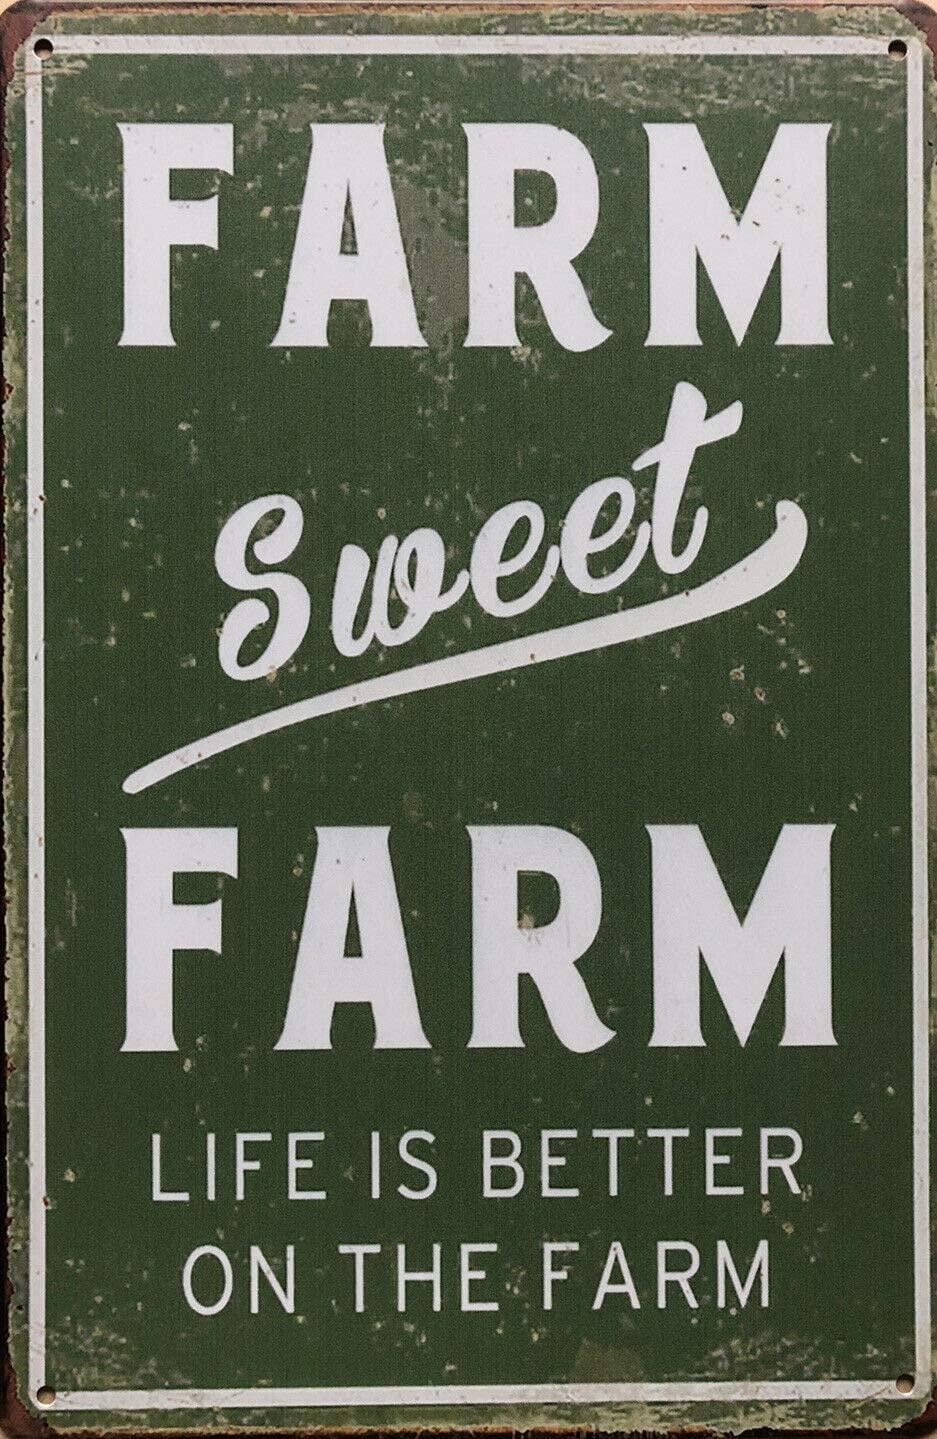 Farm Sweet Farm Garage Rustic Vintage Tin Signs Man Cave, Shed,bar & Home Decor